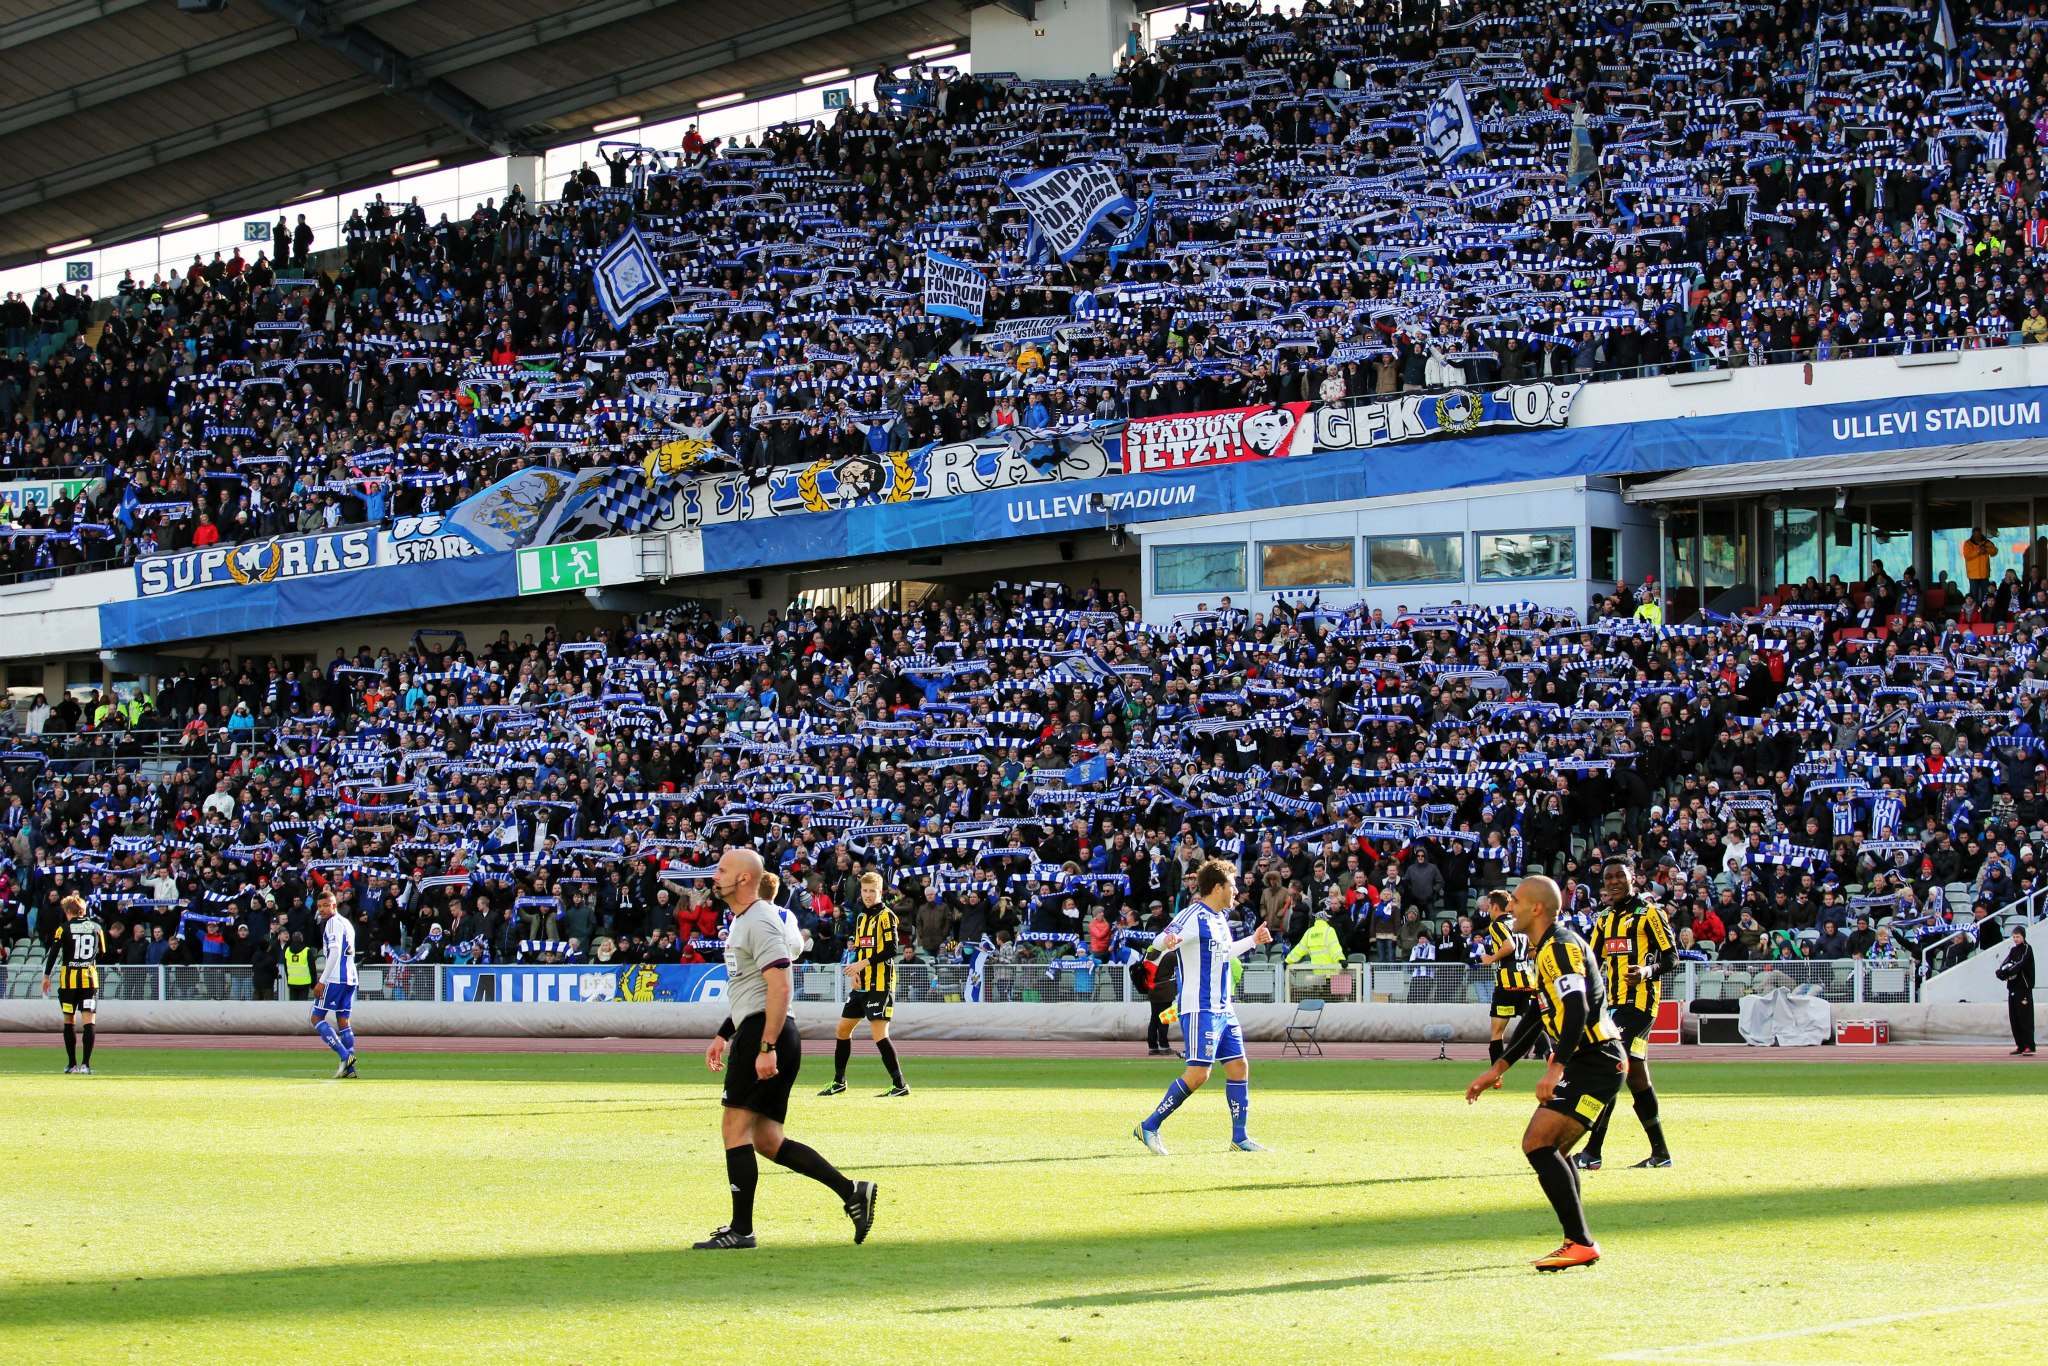 Ponturi pariuri – AIK Stockholm vs Goteborg – Allsvenskan